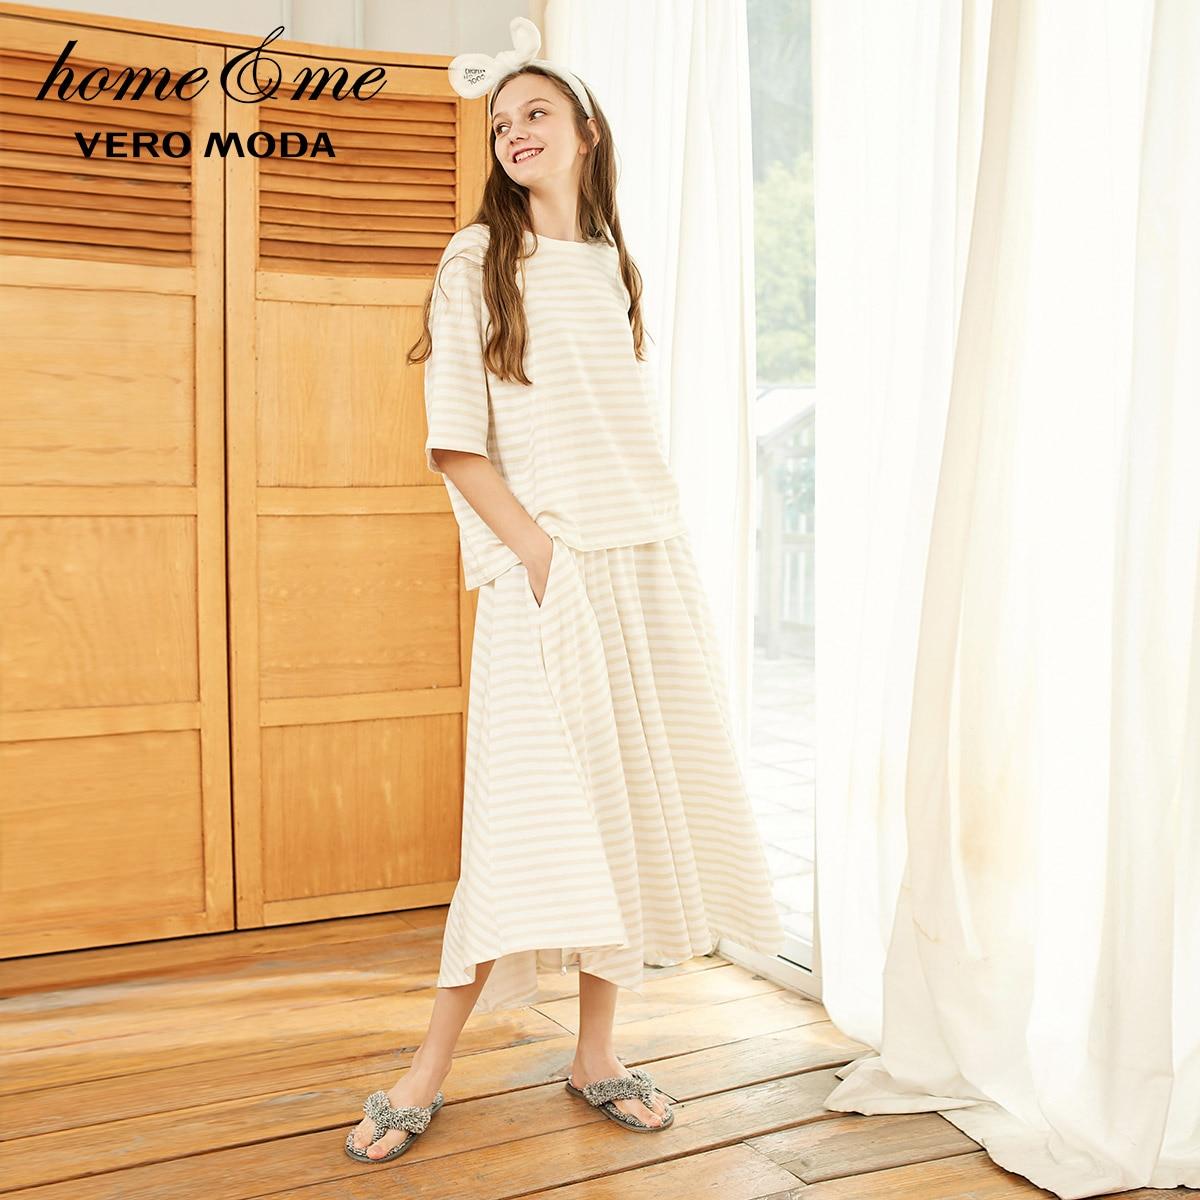 Vero Moda Women's 100% Cotton Loose Fit Striped Nightwear Suit Pajamas Sets | 3191TS501